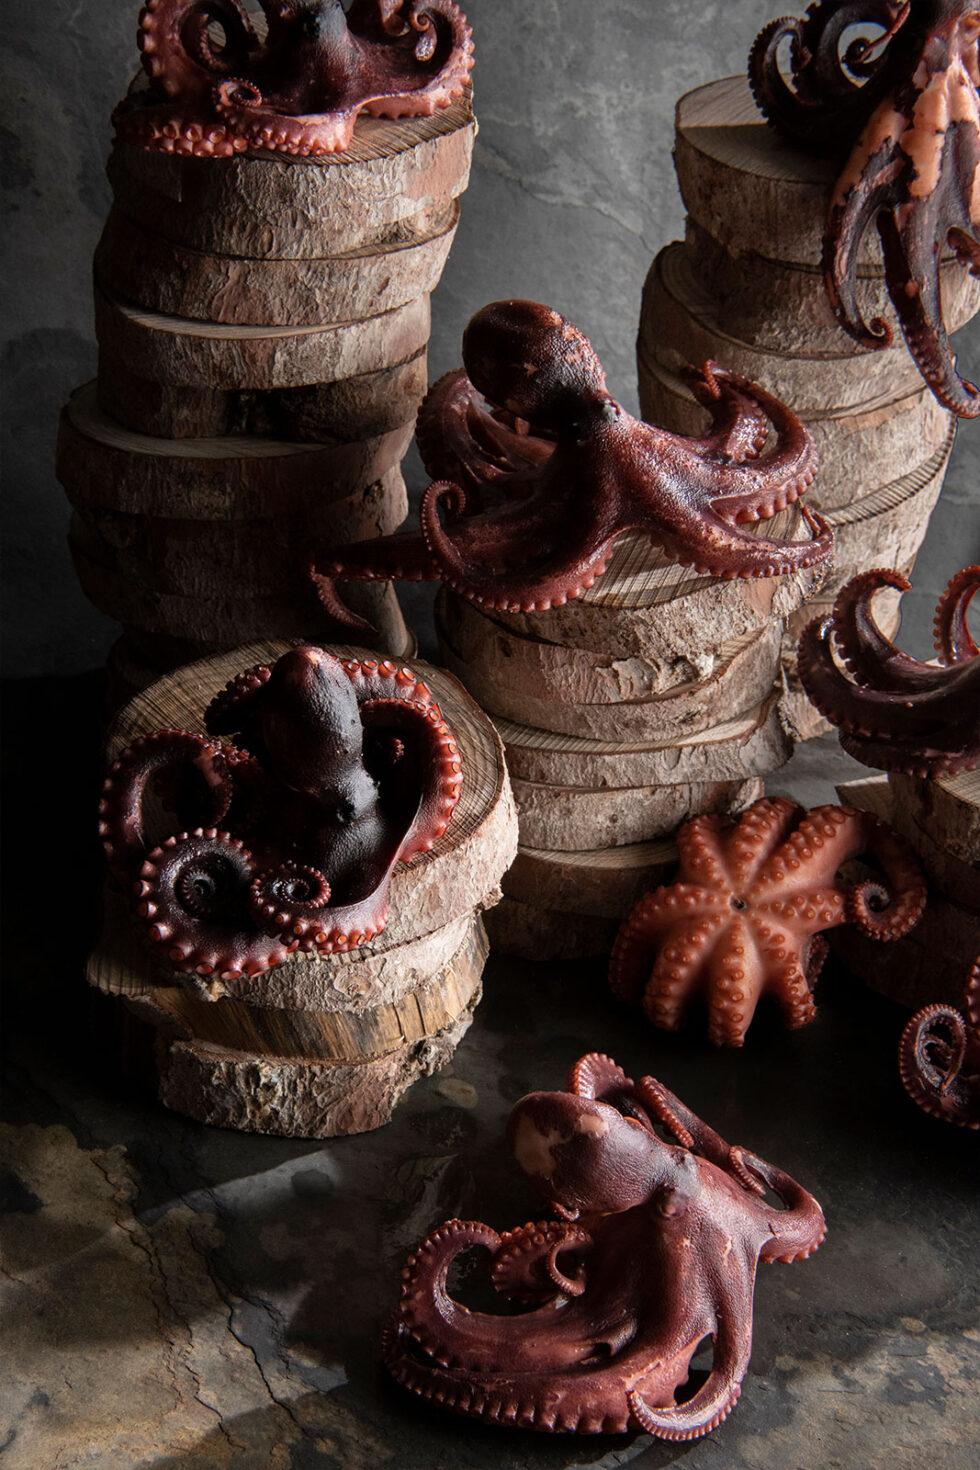 Octopus on logs again